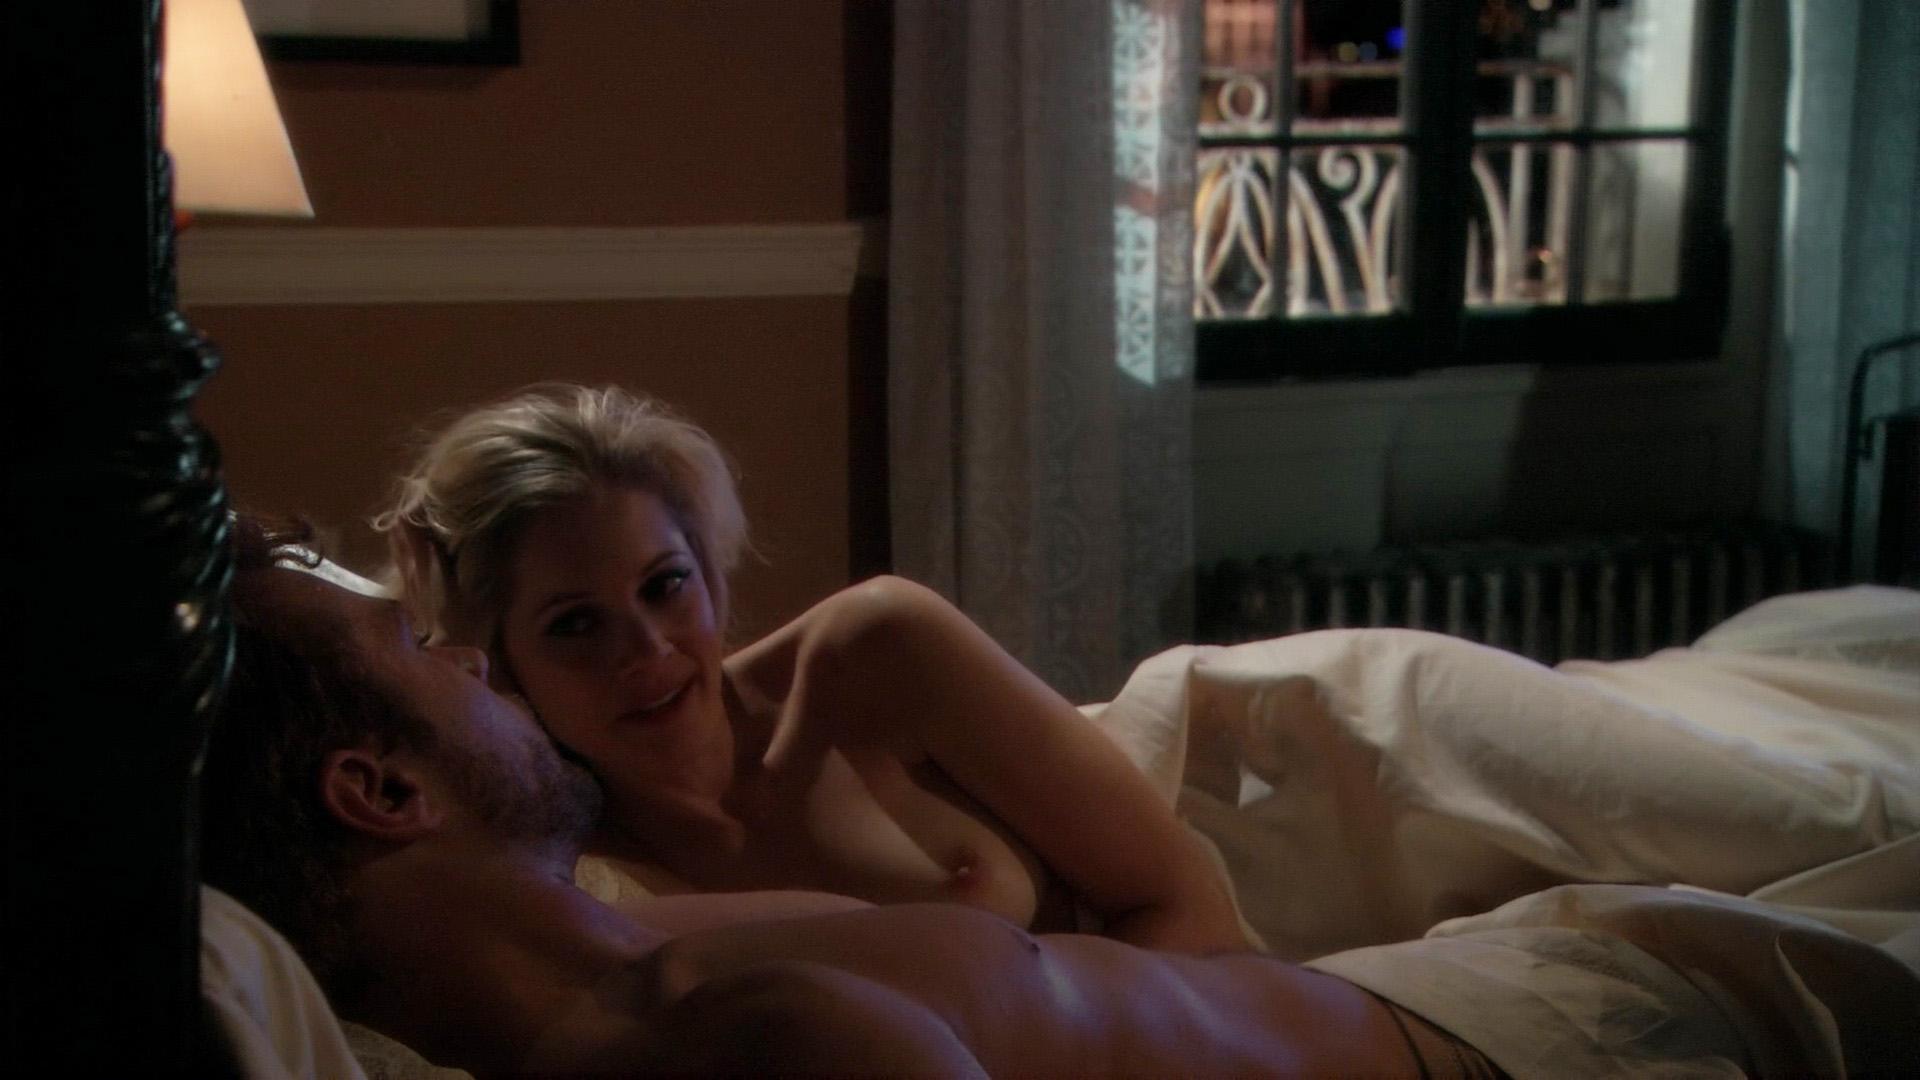 Jenna elfman nude sex video